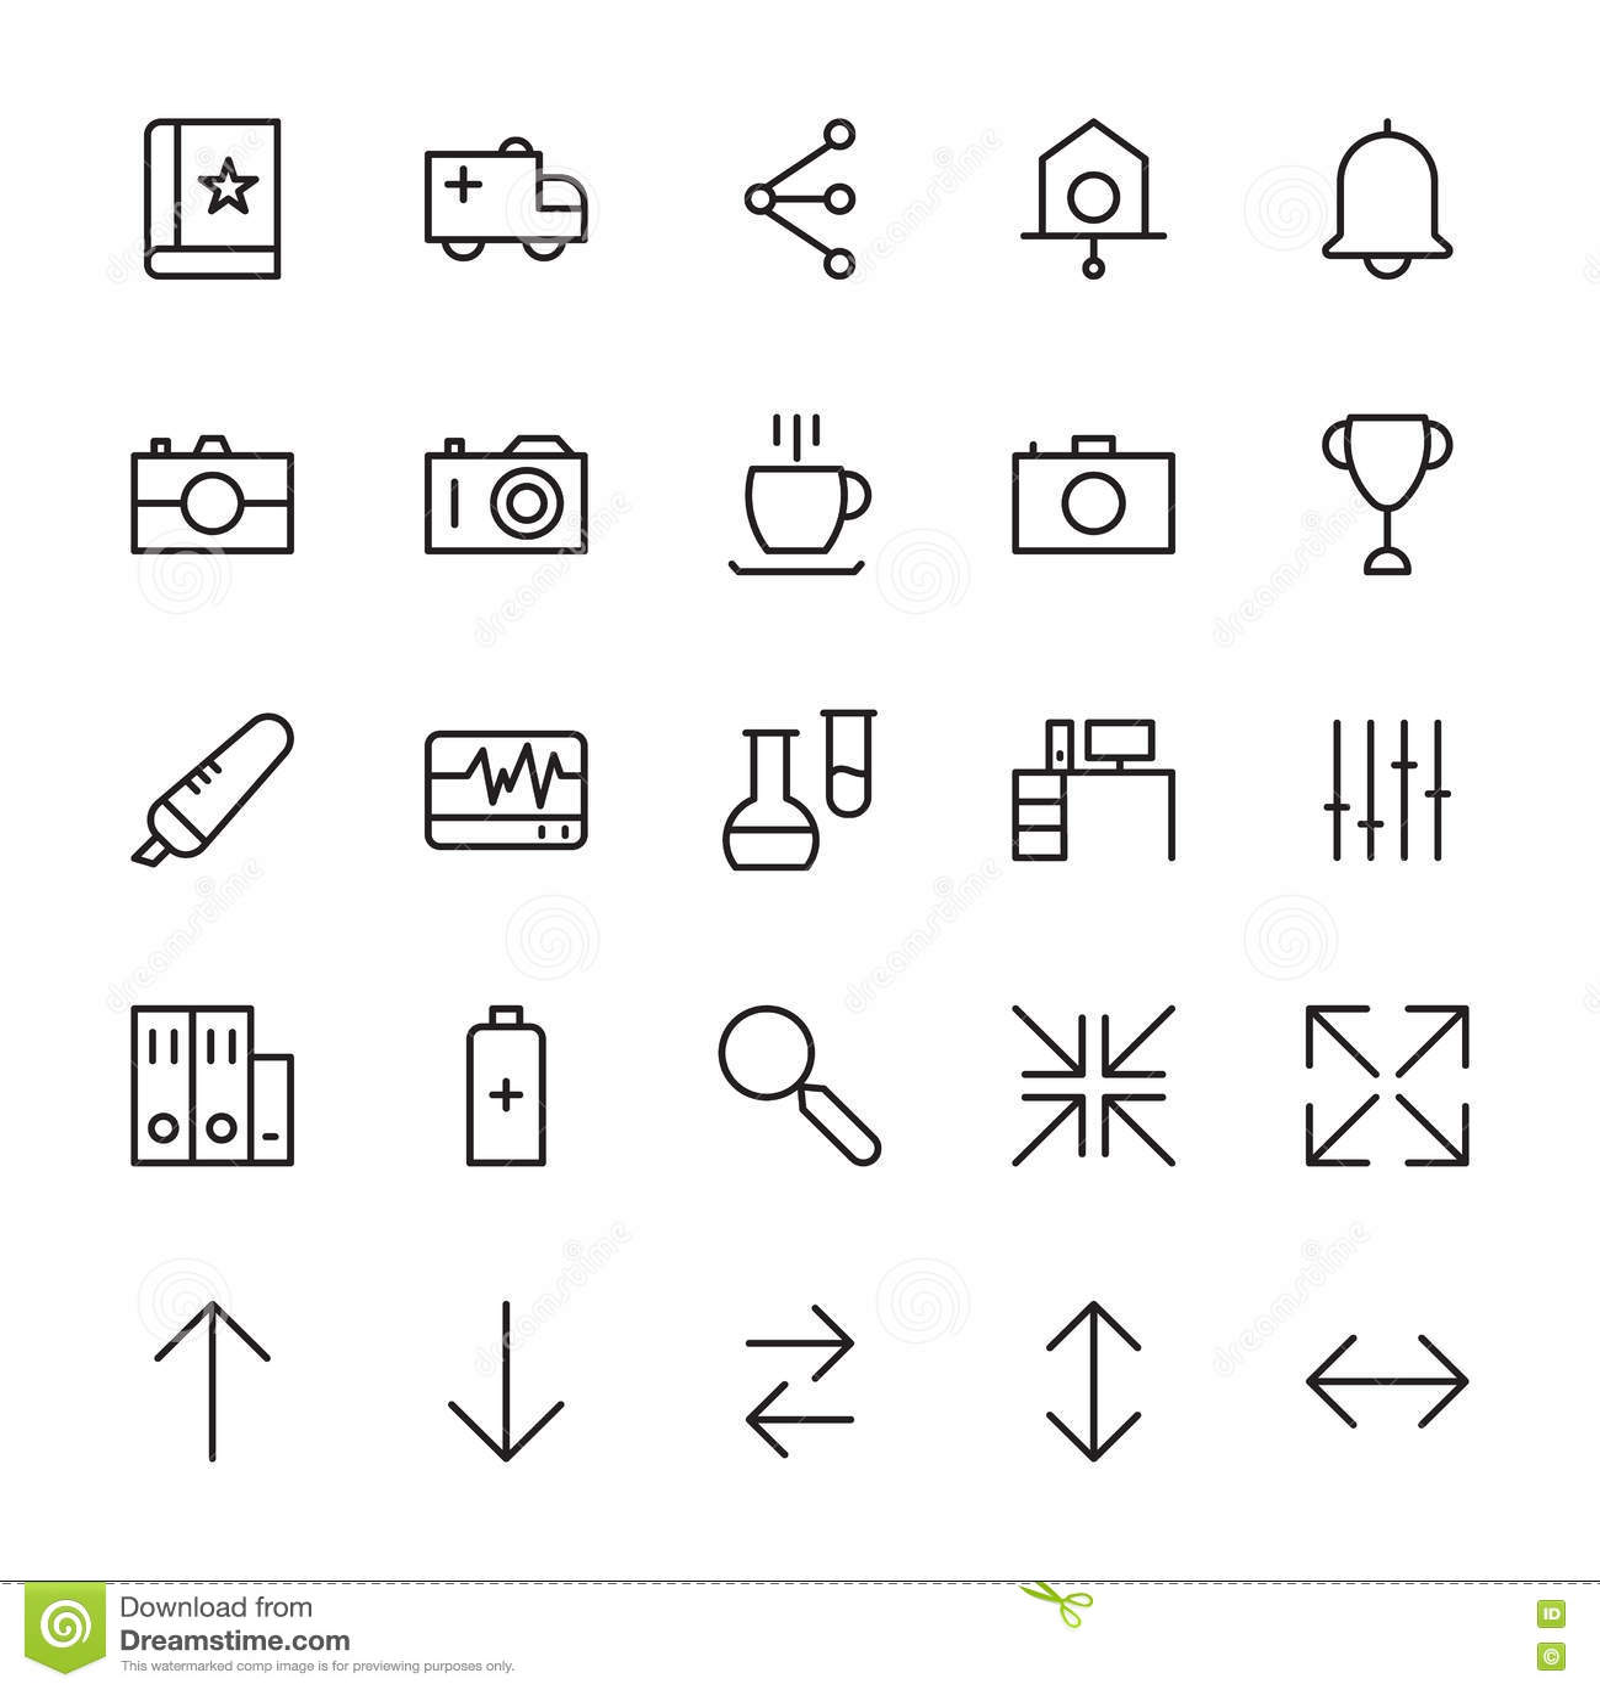 ecg cartoons  illustrations  u0026 vector stock images